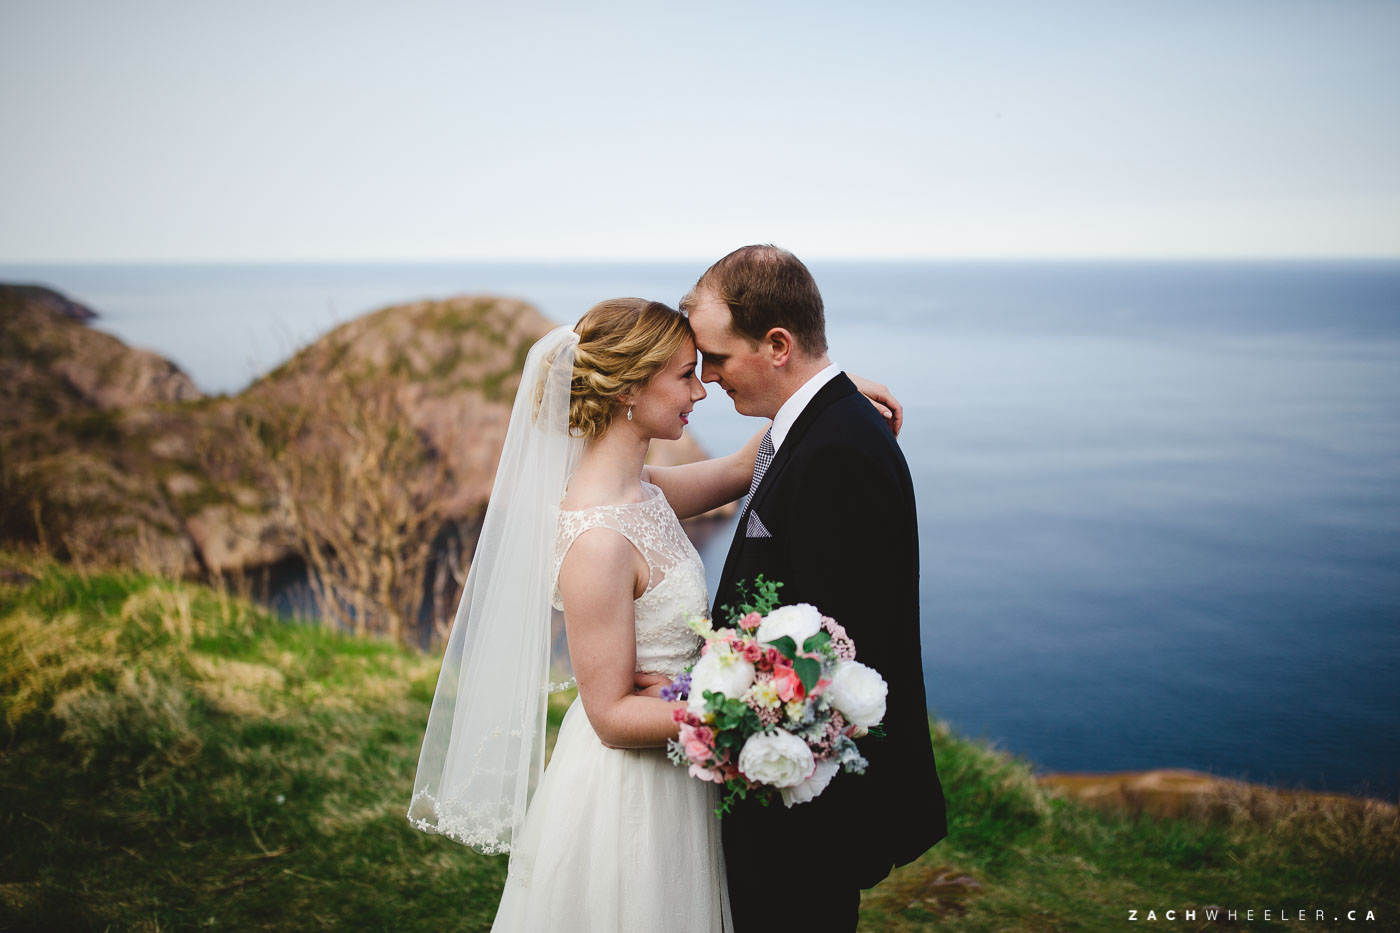 Sarah-Grant-Lesters-Fram-Wedding-60